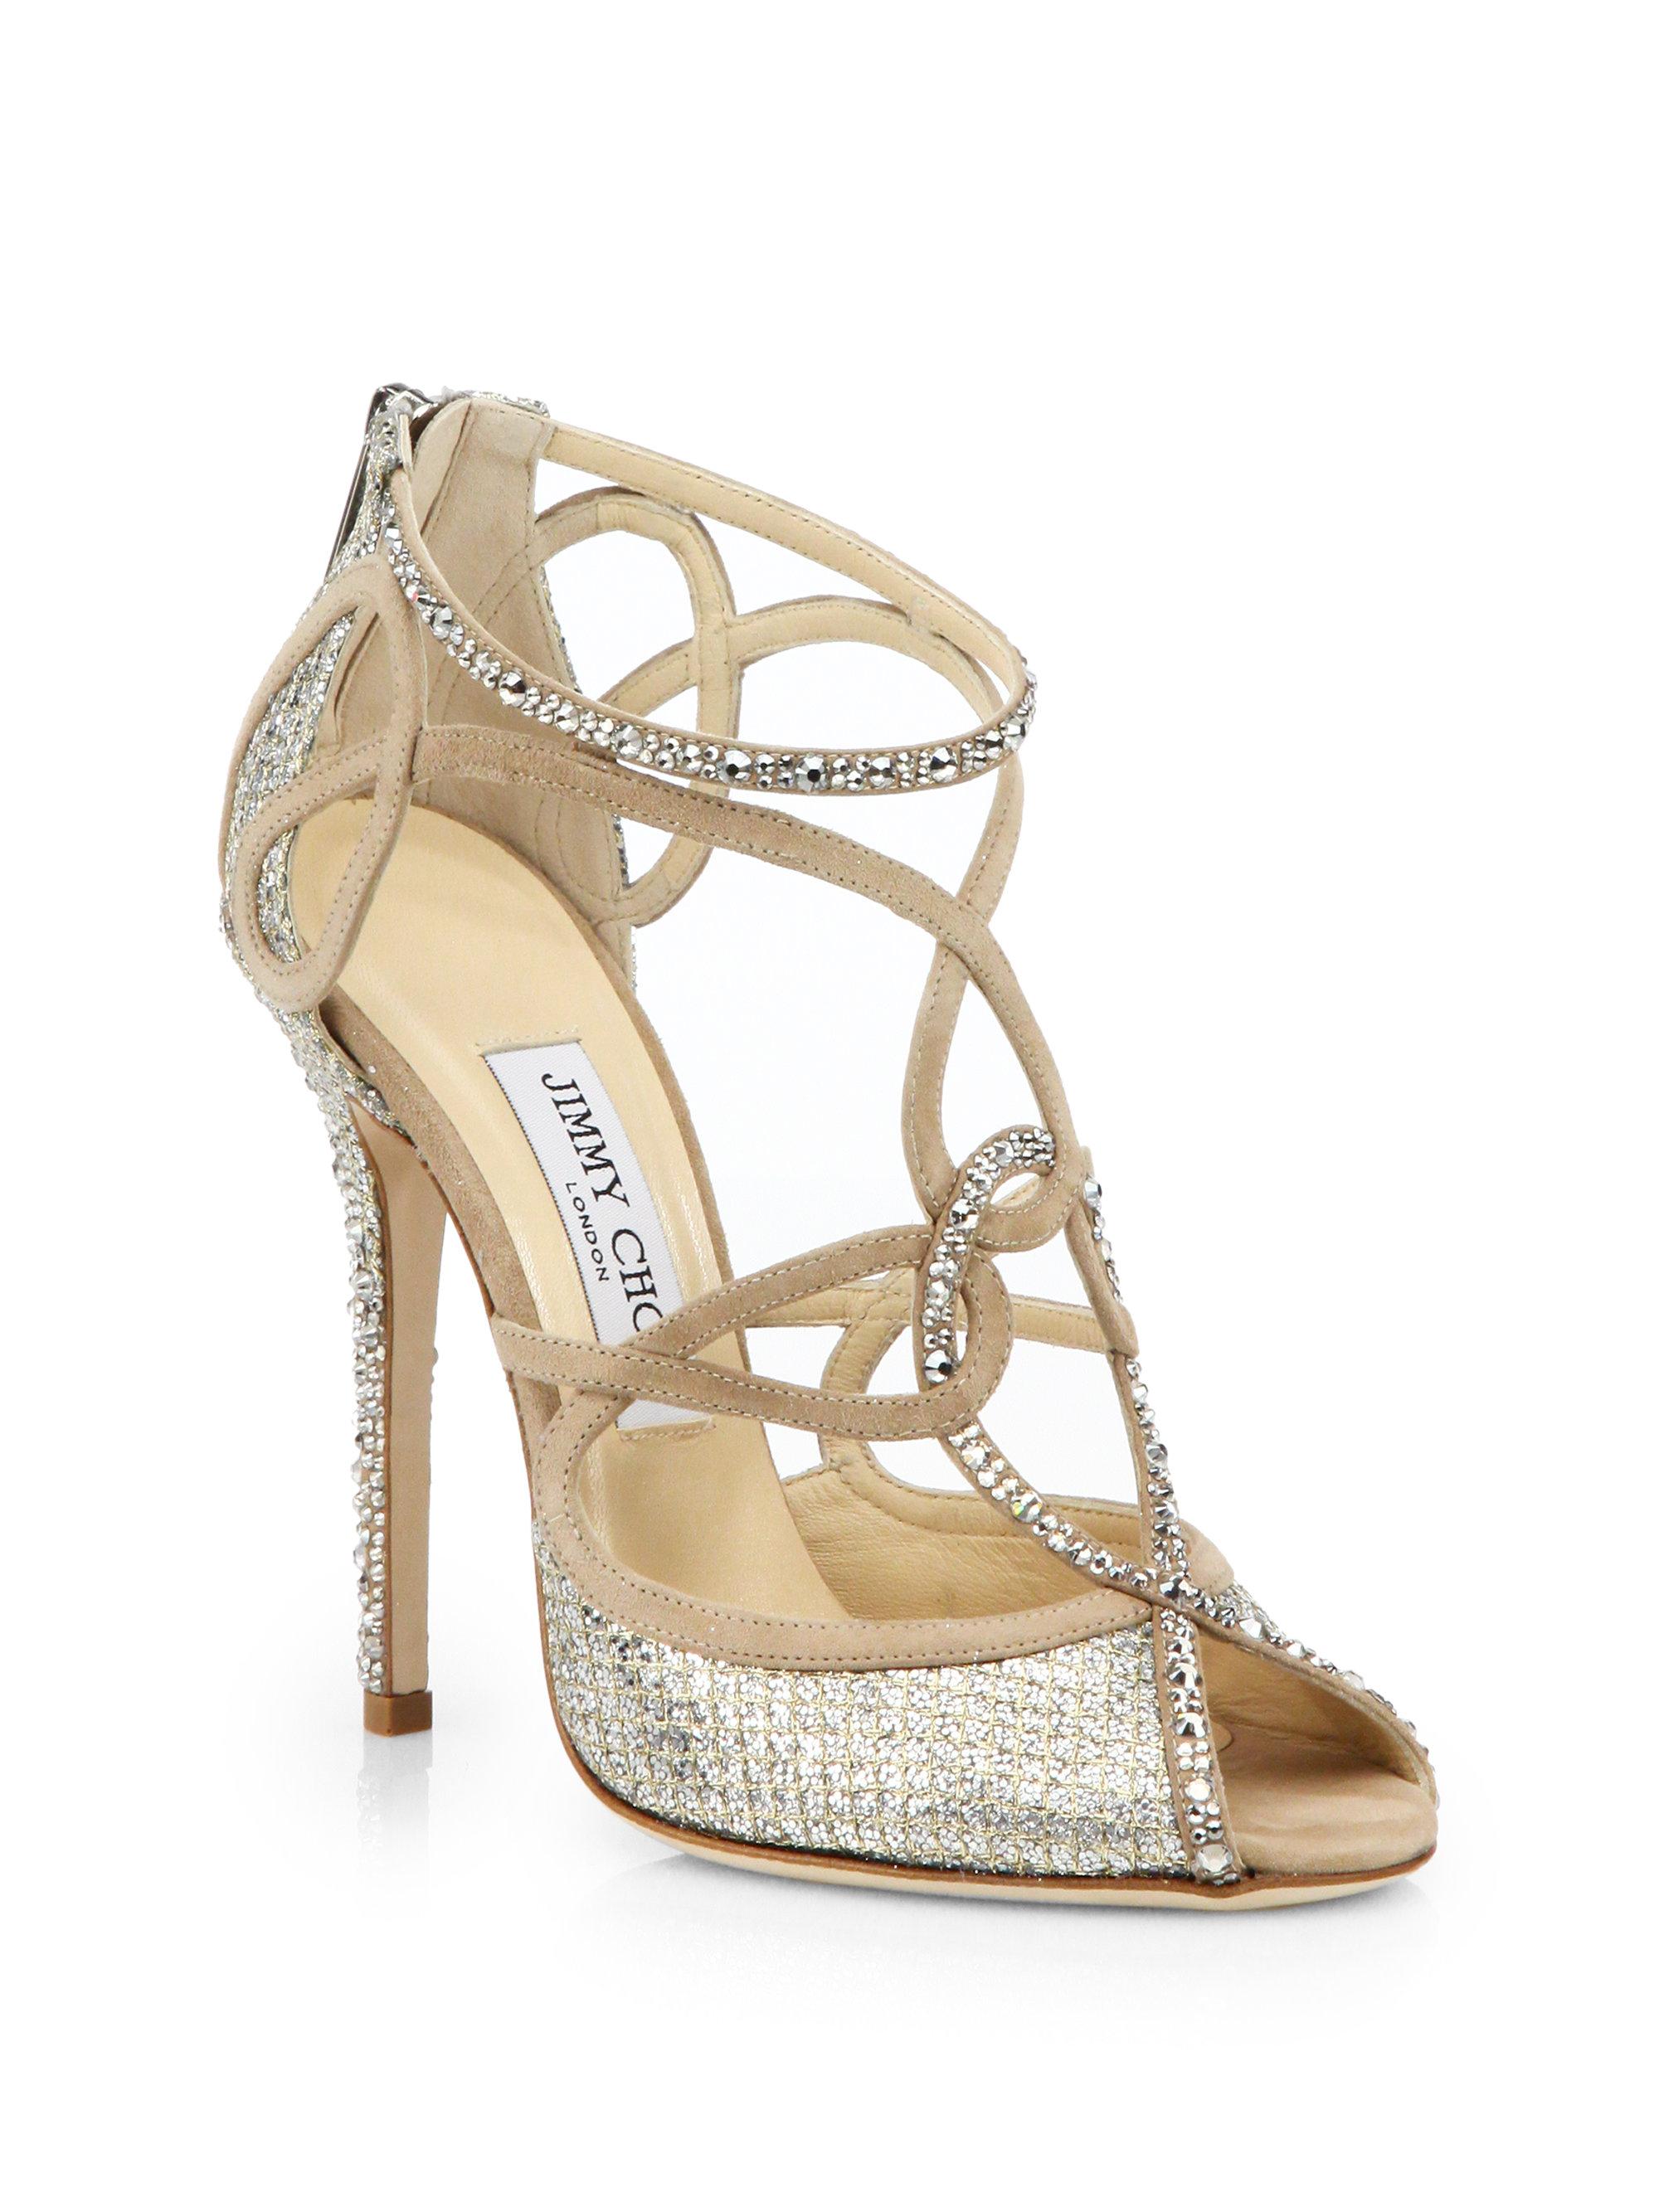 0e2d29a7abdad7 Lyst - Jimmy Choo Swarovski Crystal-Covered Suede Sandals in Metallic